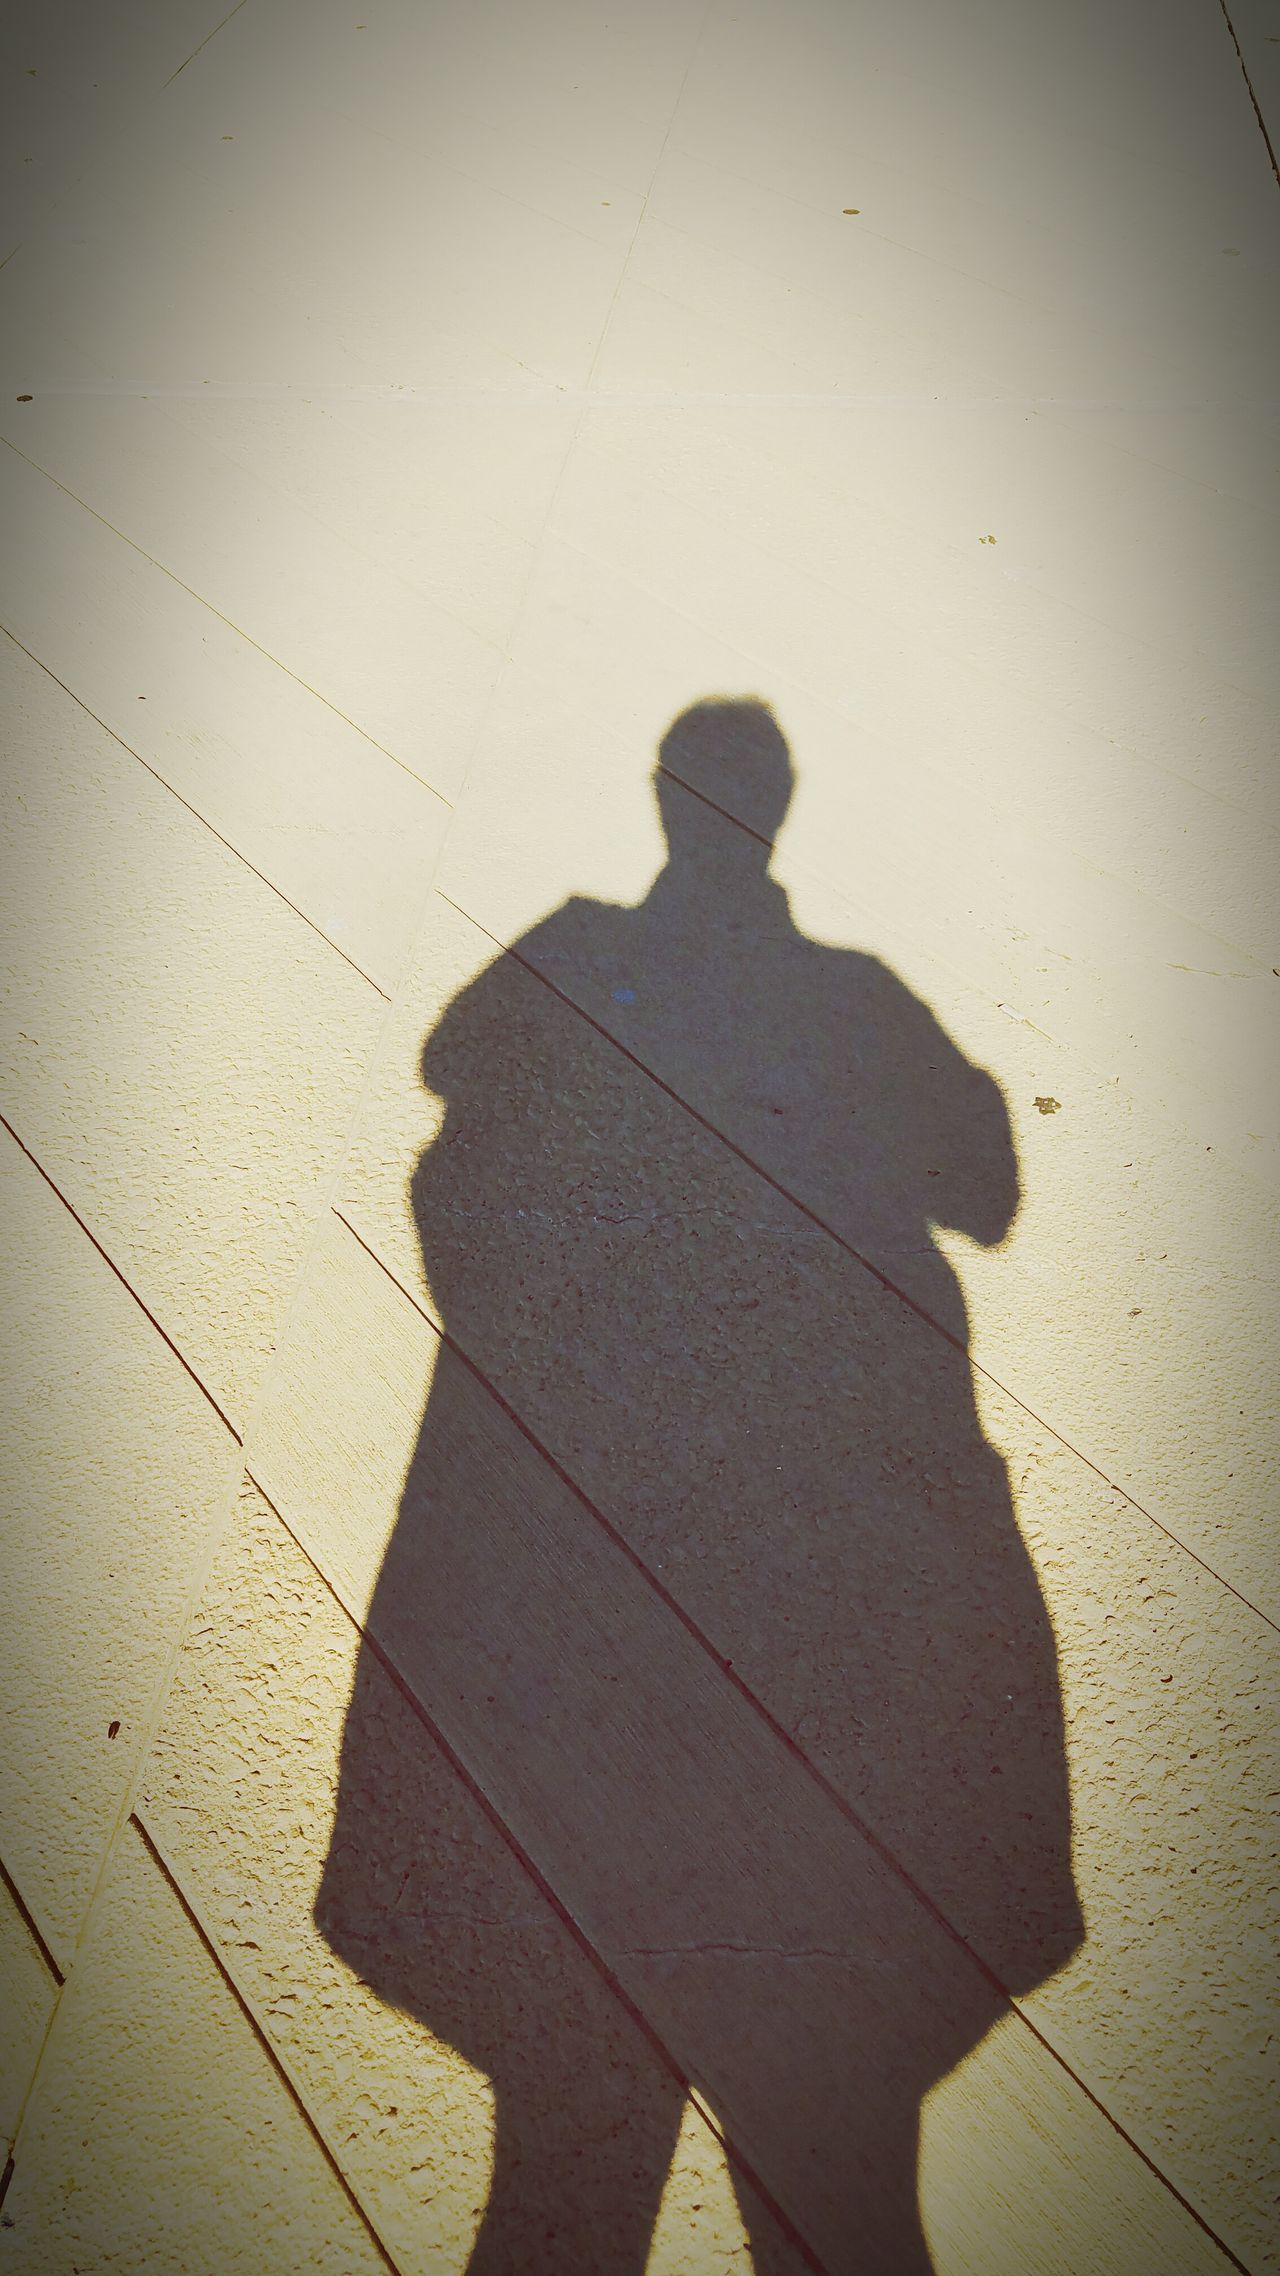 The Shadowman